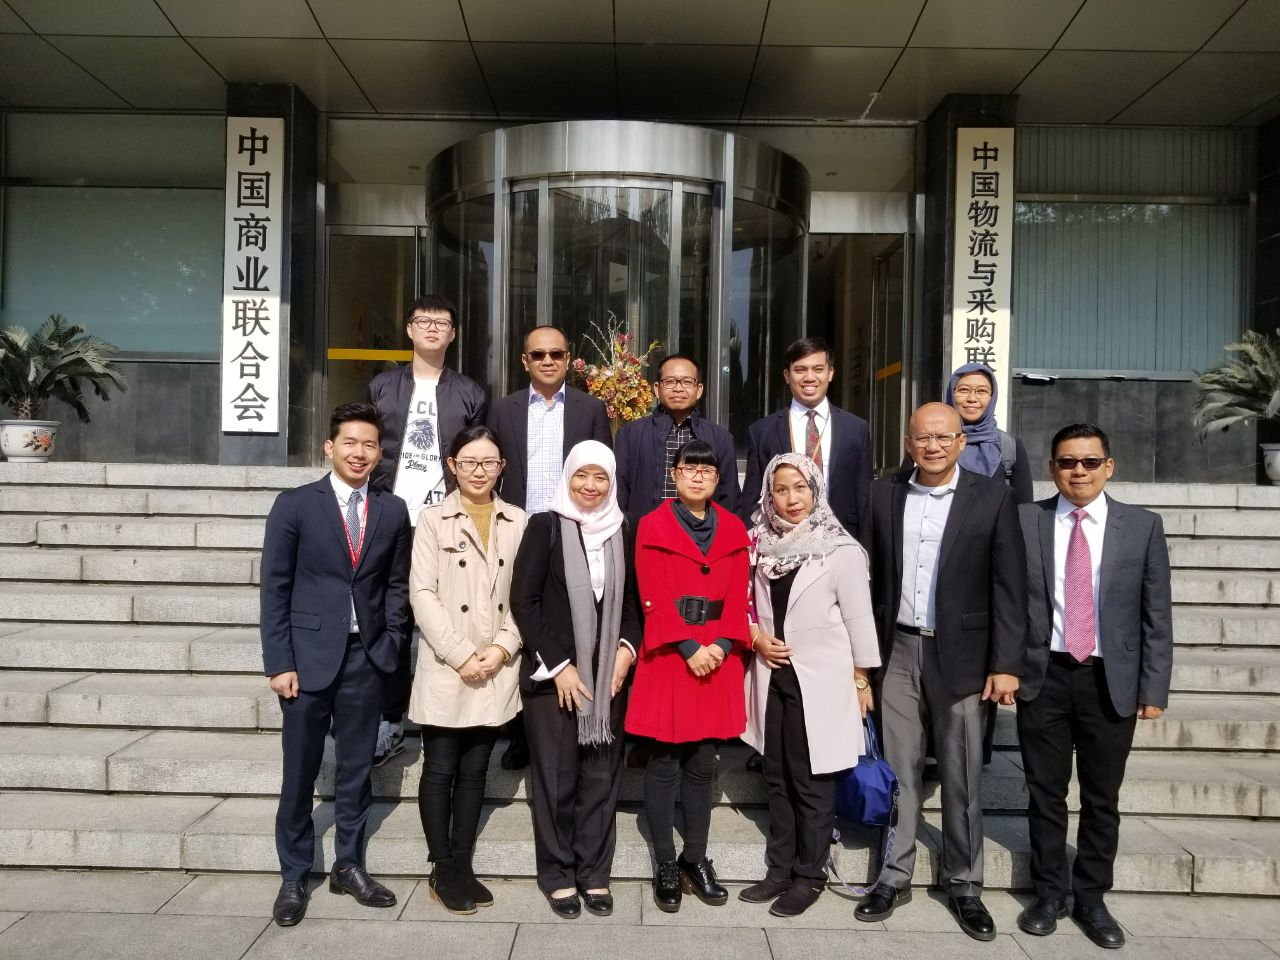 Kunjungan Asparindo bersama BI Perwakilan DKI Jakarta ke CAWA-Beijing